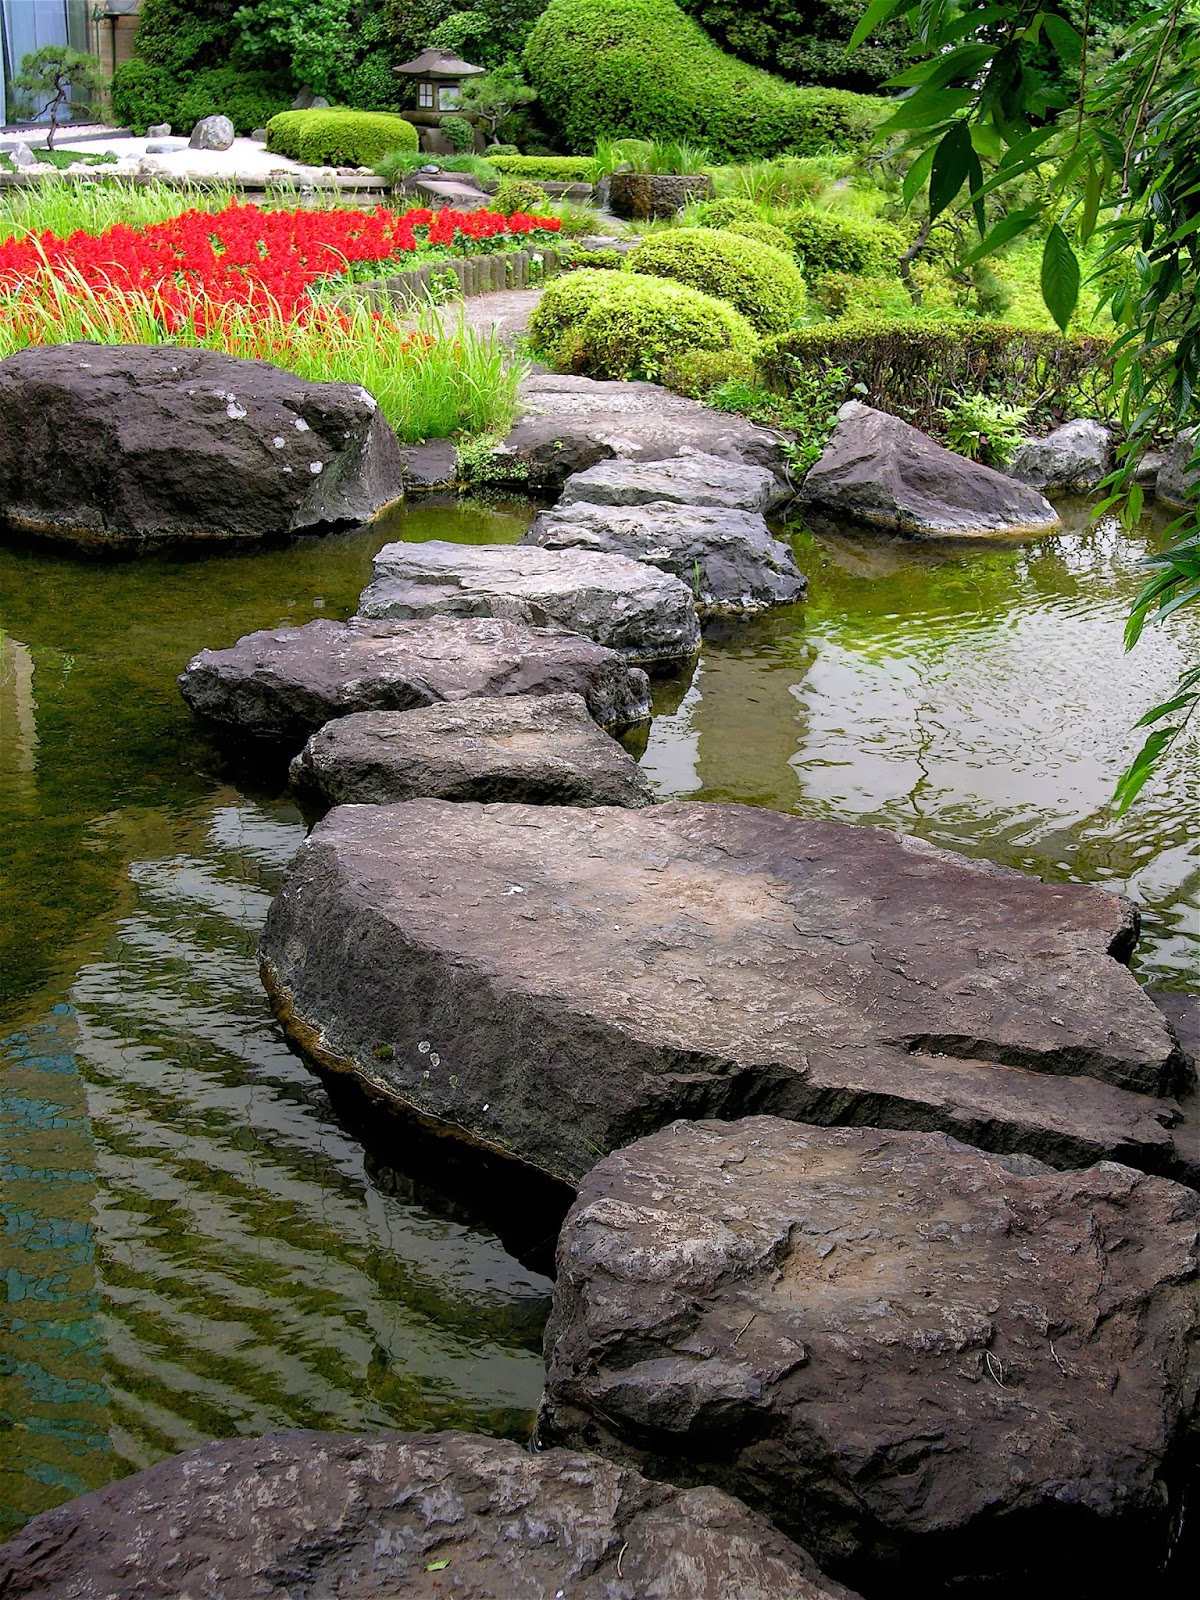 Japanese Aesthetics, Wabi-Sabi, And The Tea Ceremony